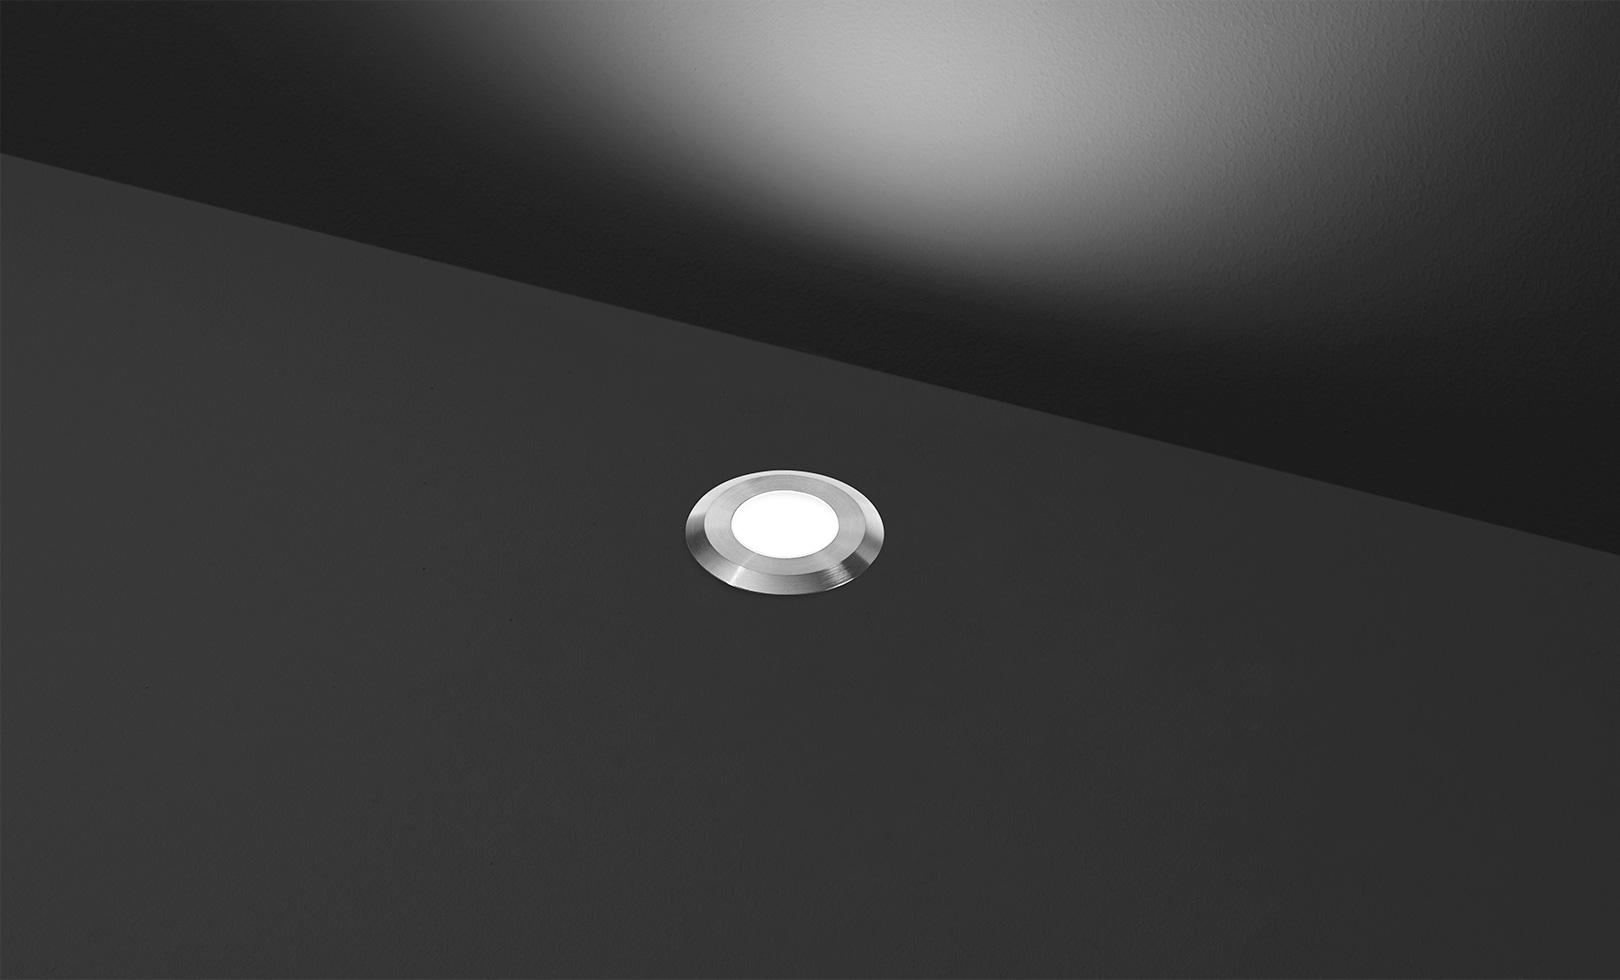 201061 HYDROFLOOR SMALL SOFT LED 1.5W 1